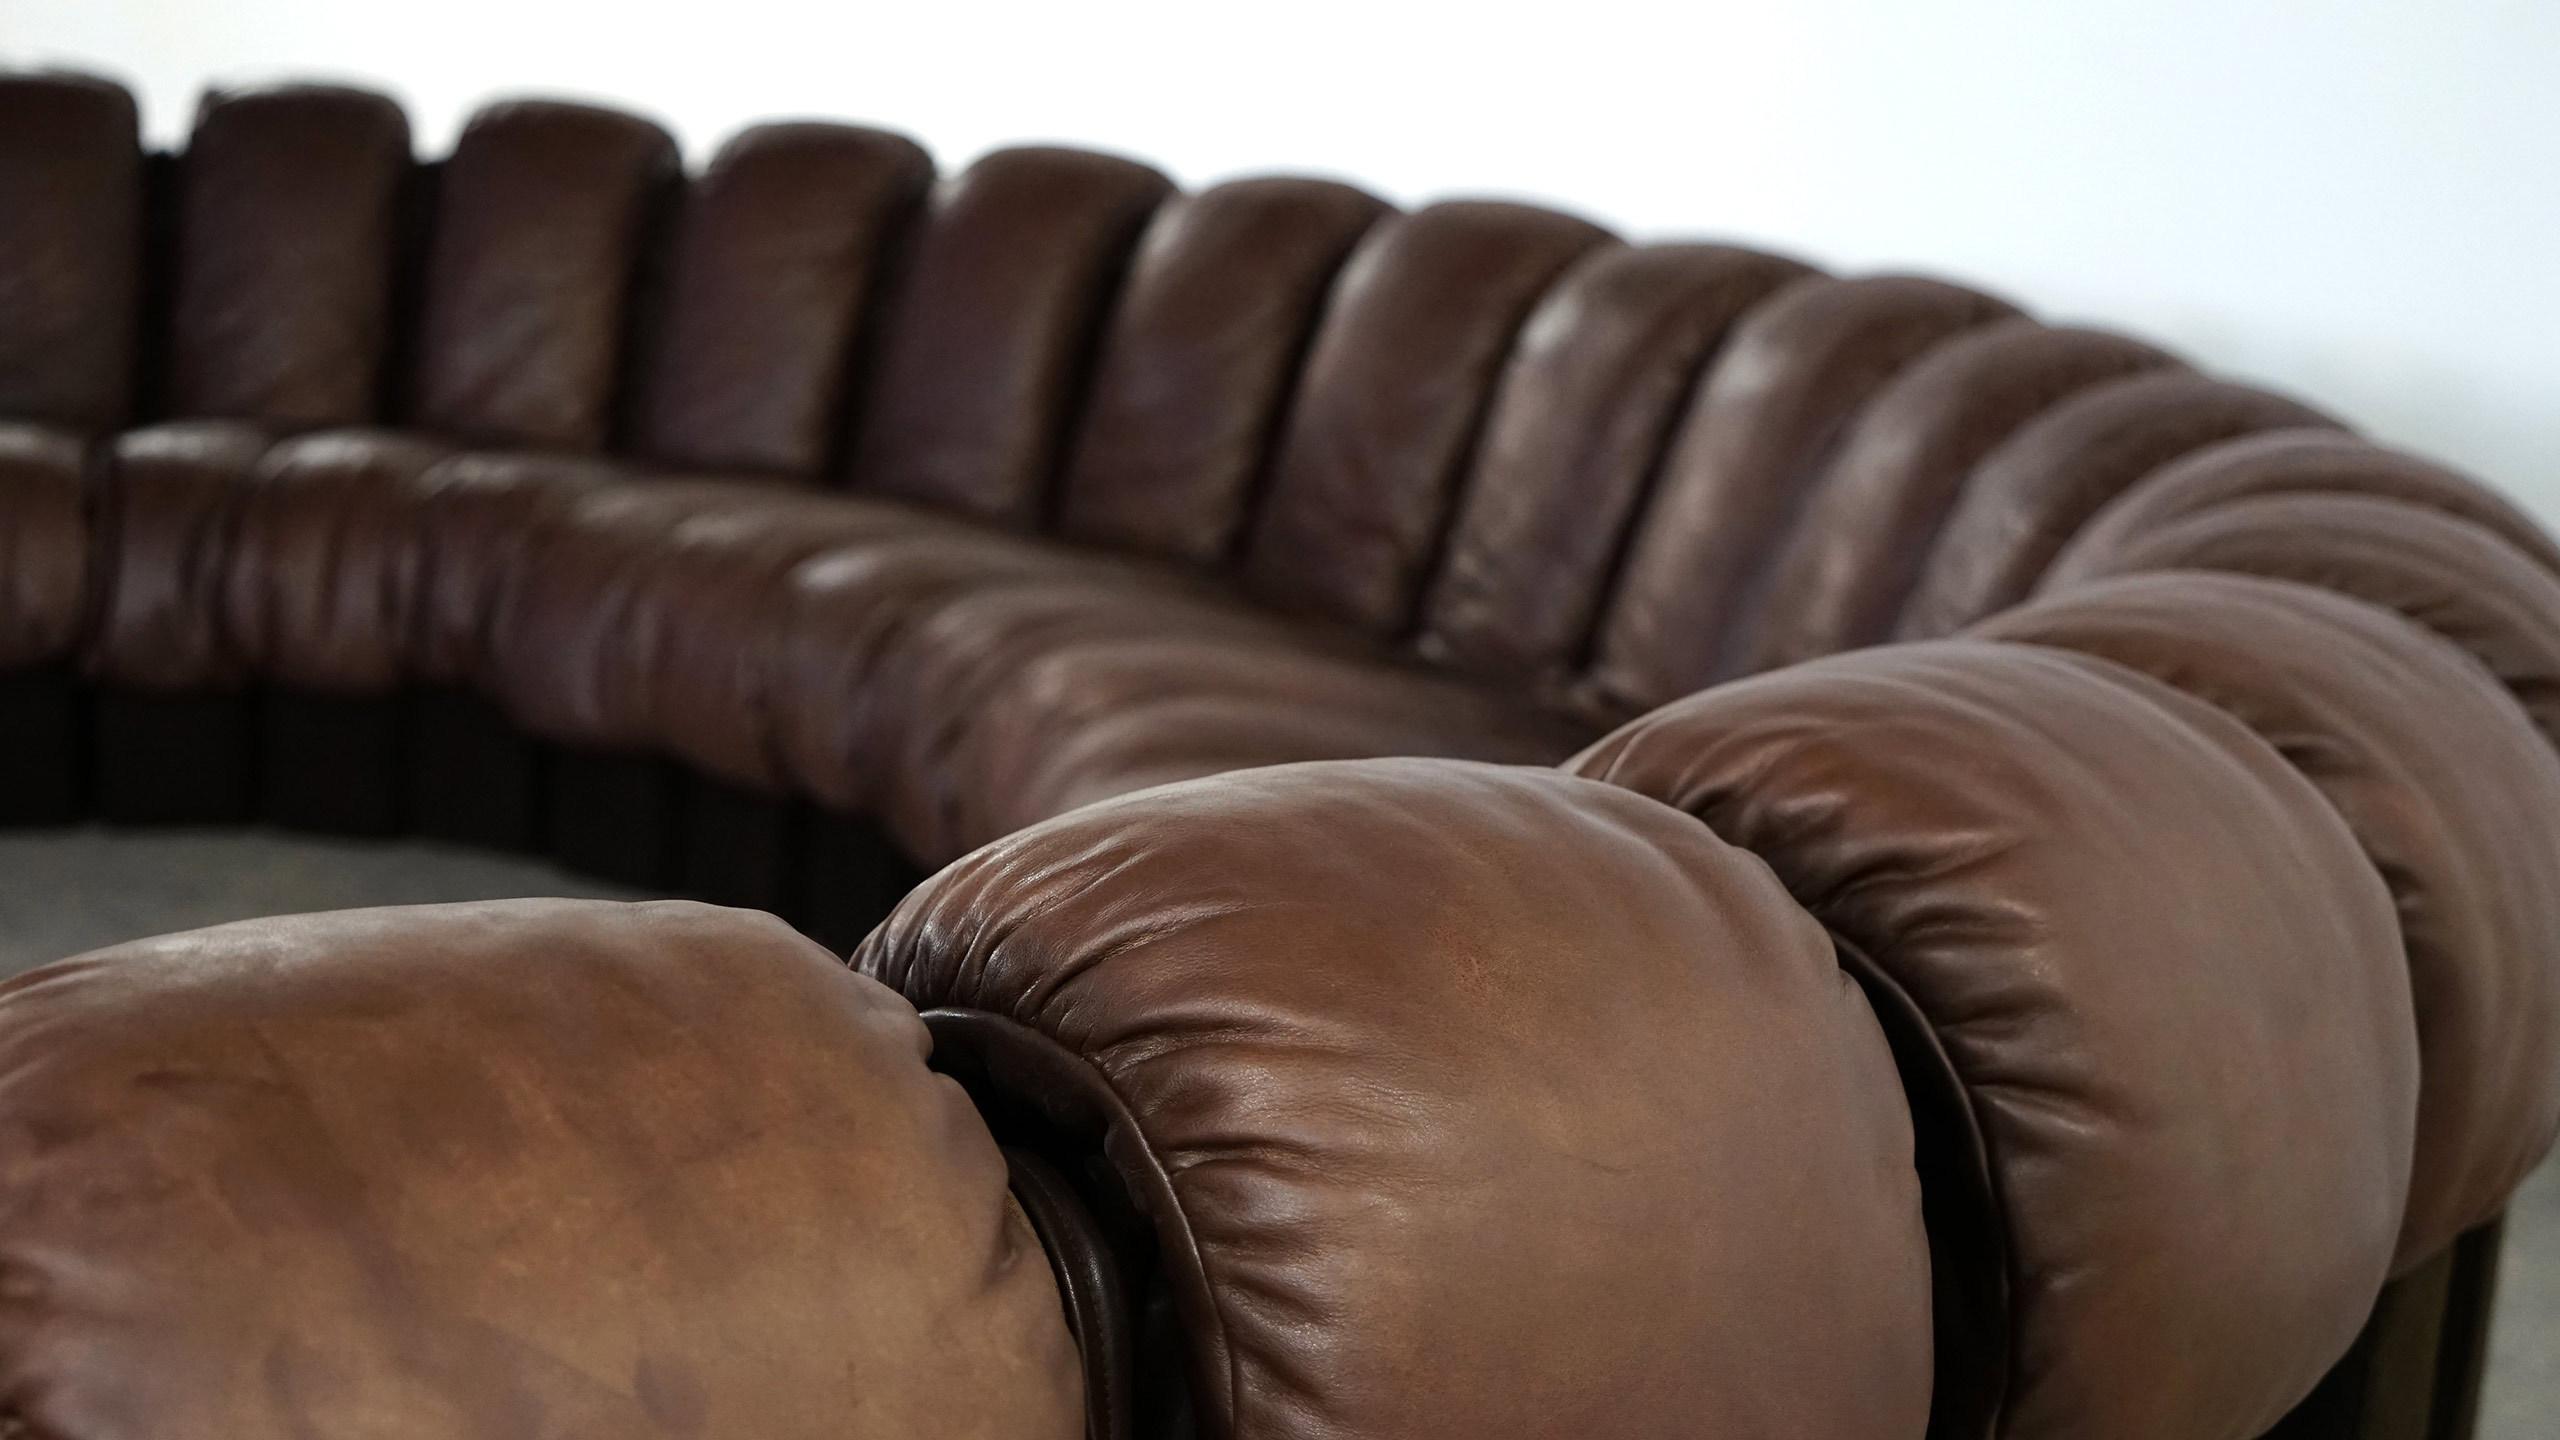 de sede endless sofa ds 600 ueli berger 1972 zorrobot. Black Bedroom Furniture Sets. Home Design Ideas